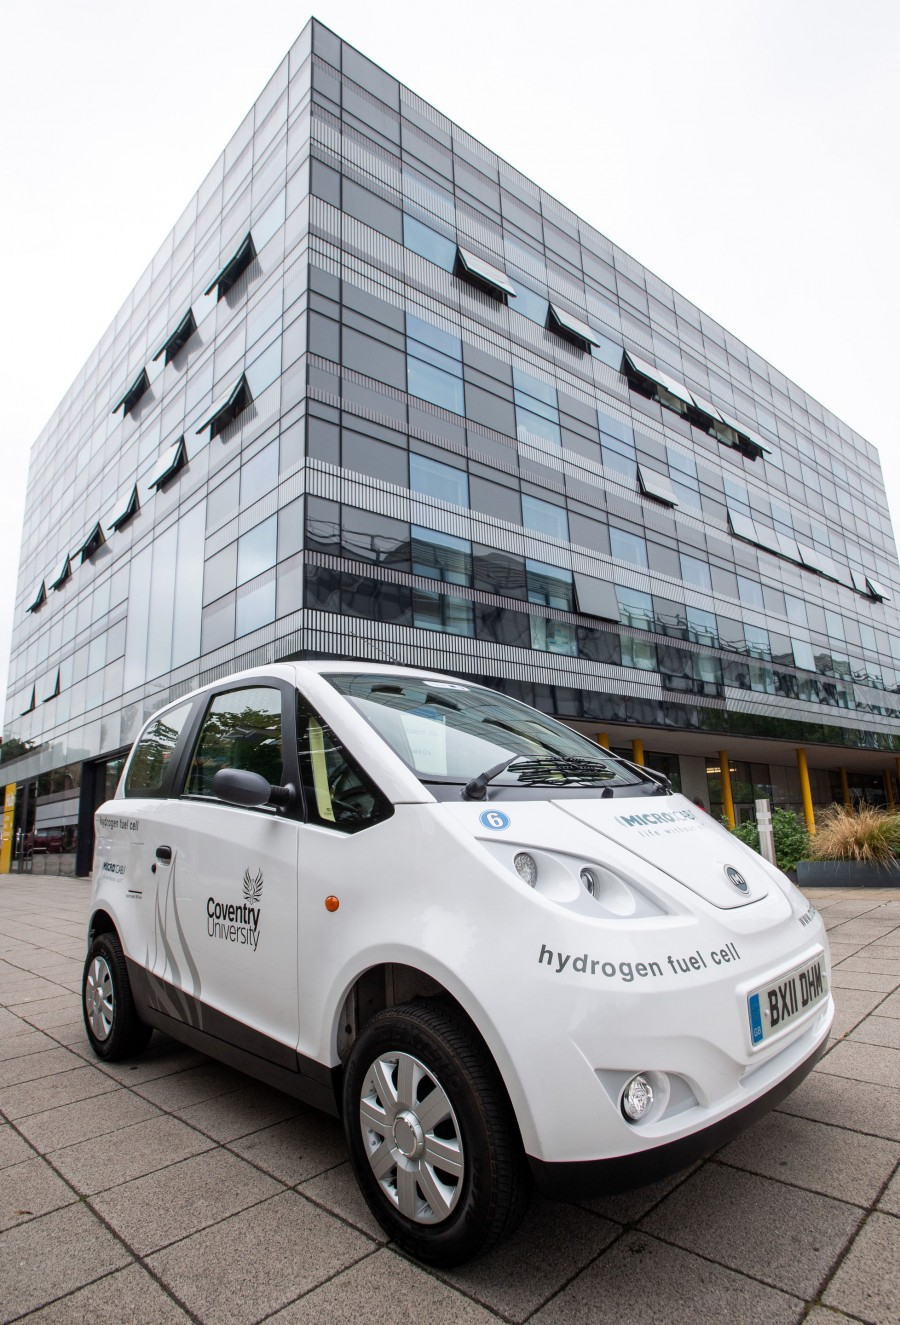 Microcab H2EV hydrogen fuel cell vehicle 2